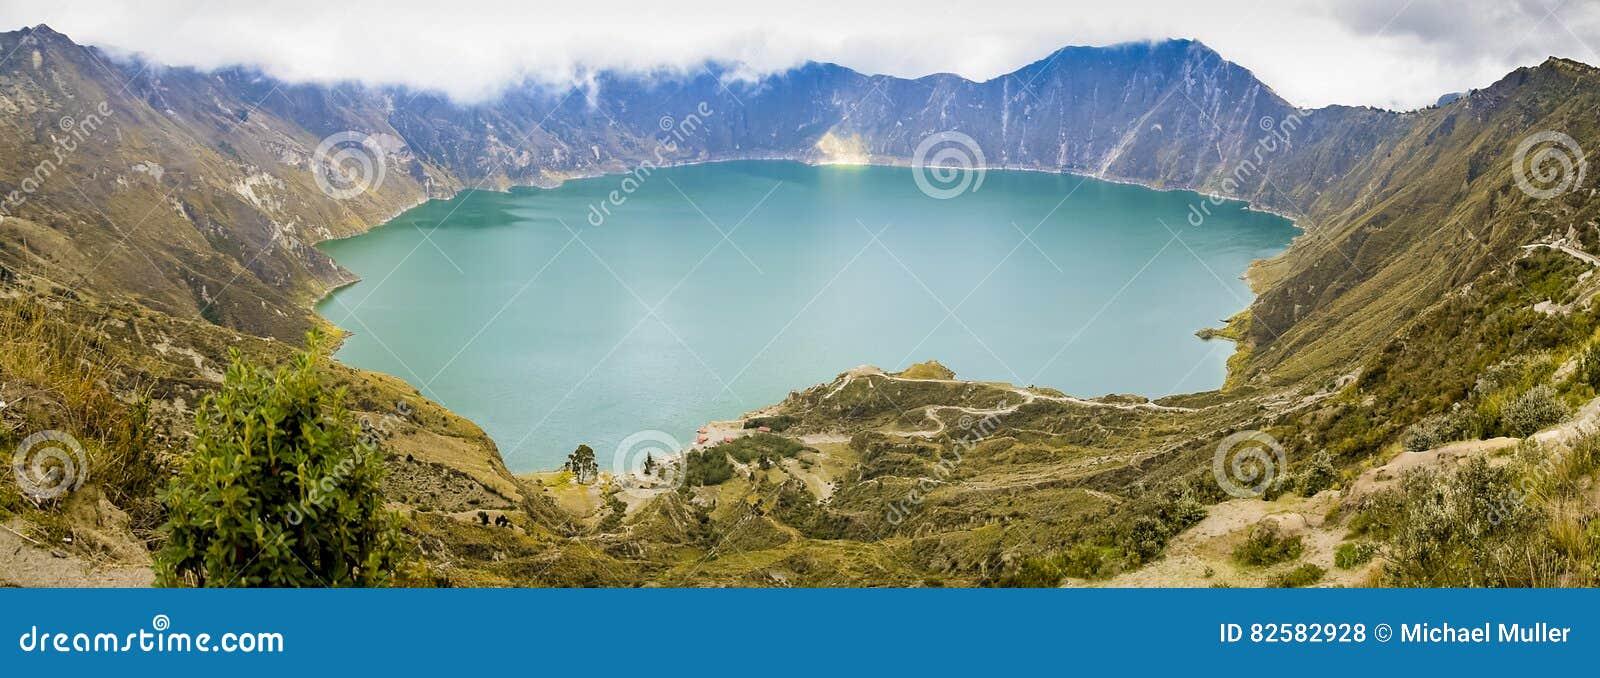 Lac Quilotoa en Equateur